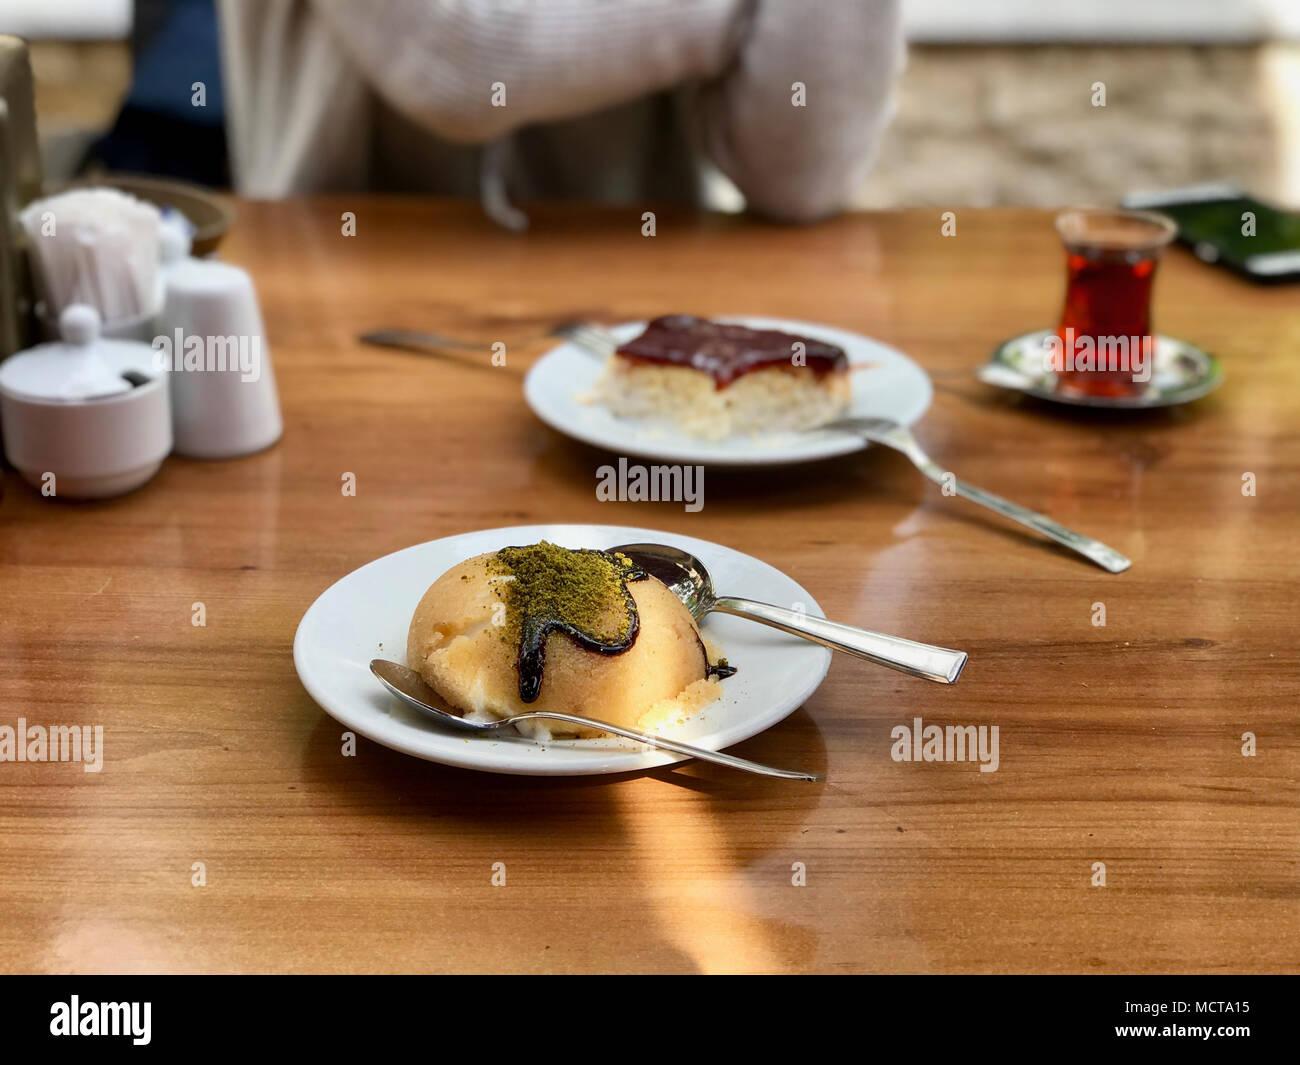 Semolina Dessert with ice cream / irmik helvasi / halva. Traditional Dessert. - Stock Image